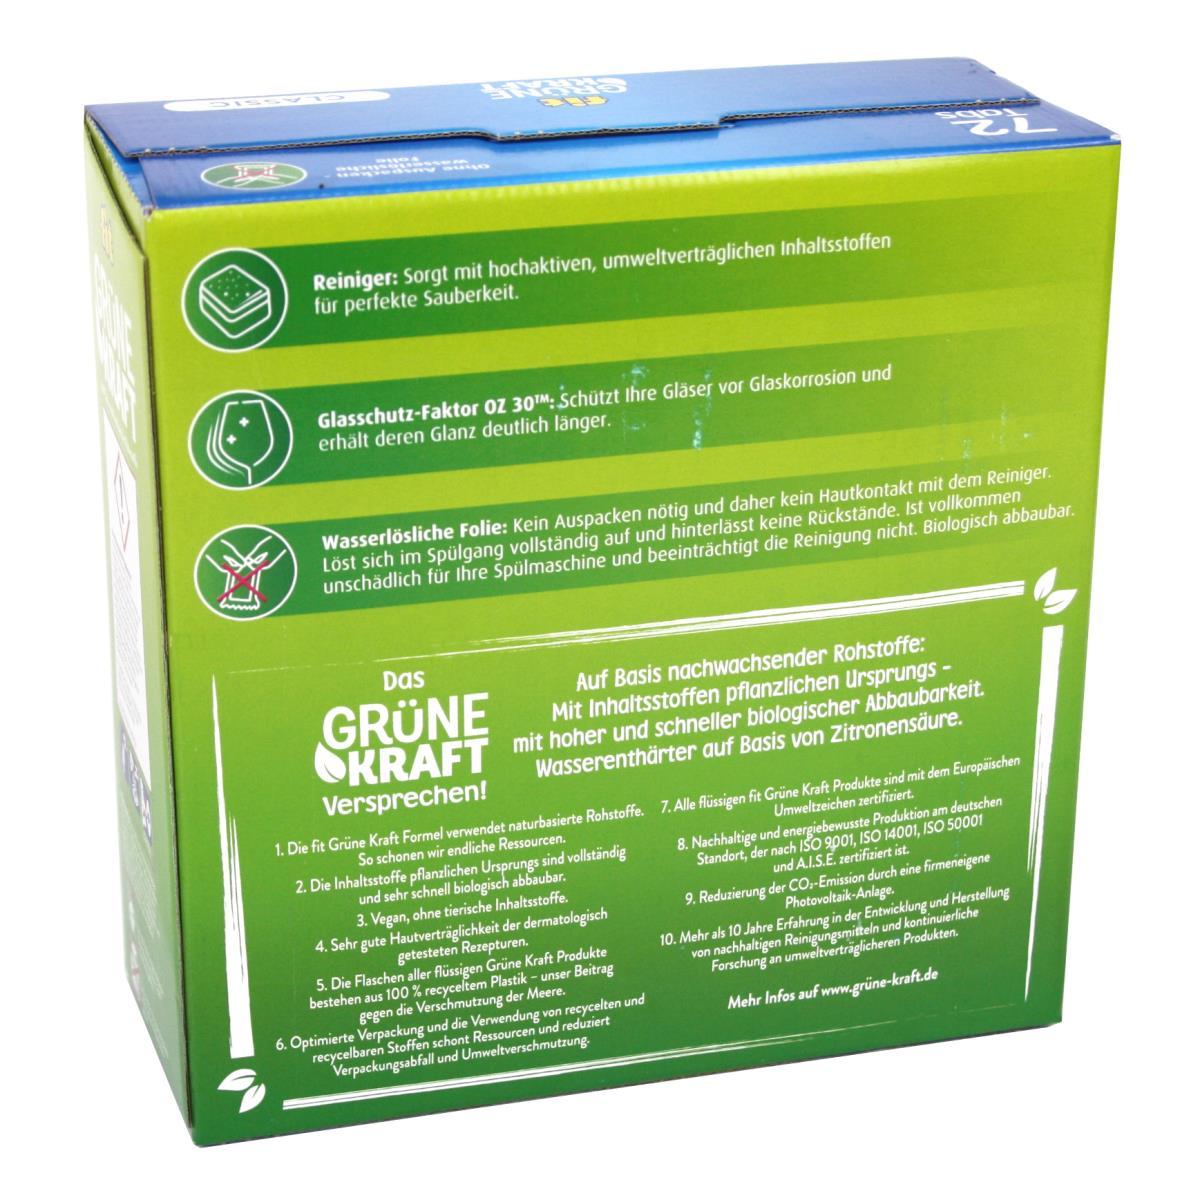 FIT Grüne Kraft Classic 288 Tabs Spülmaschinentabs Geschirrspültabs,Fit,4013162016280, 4243067014955